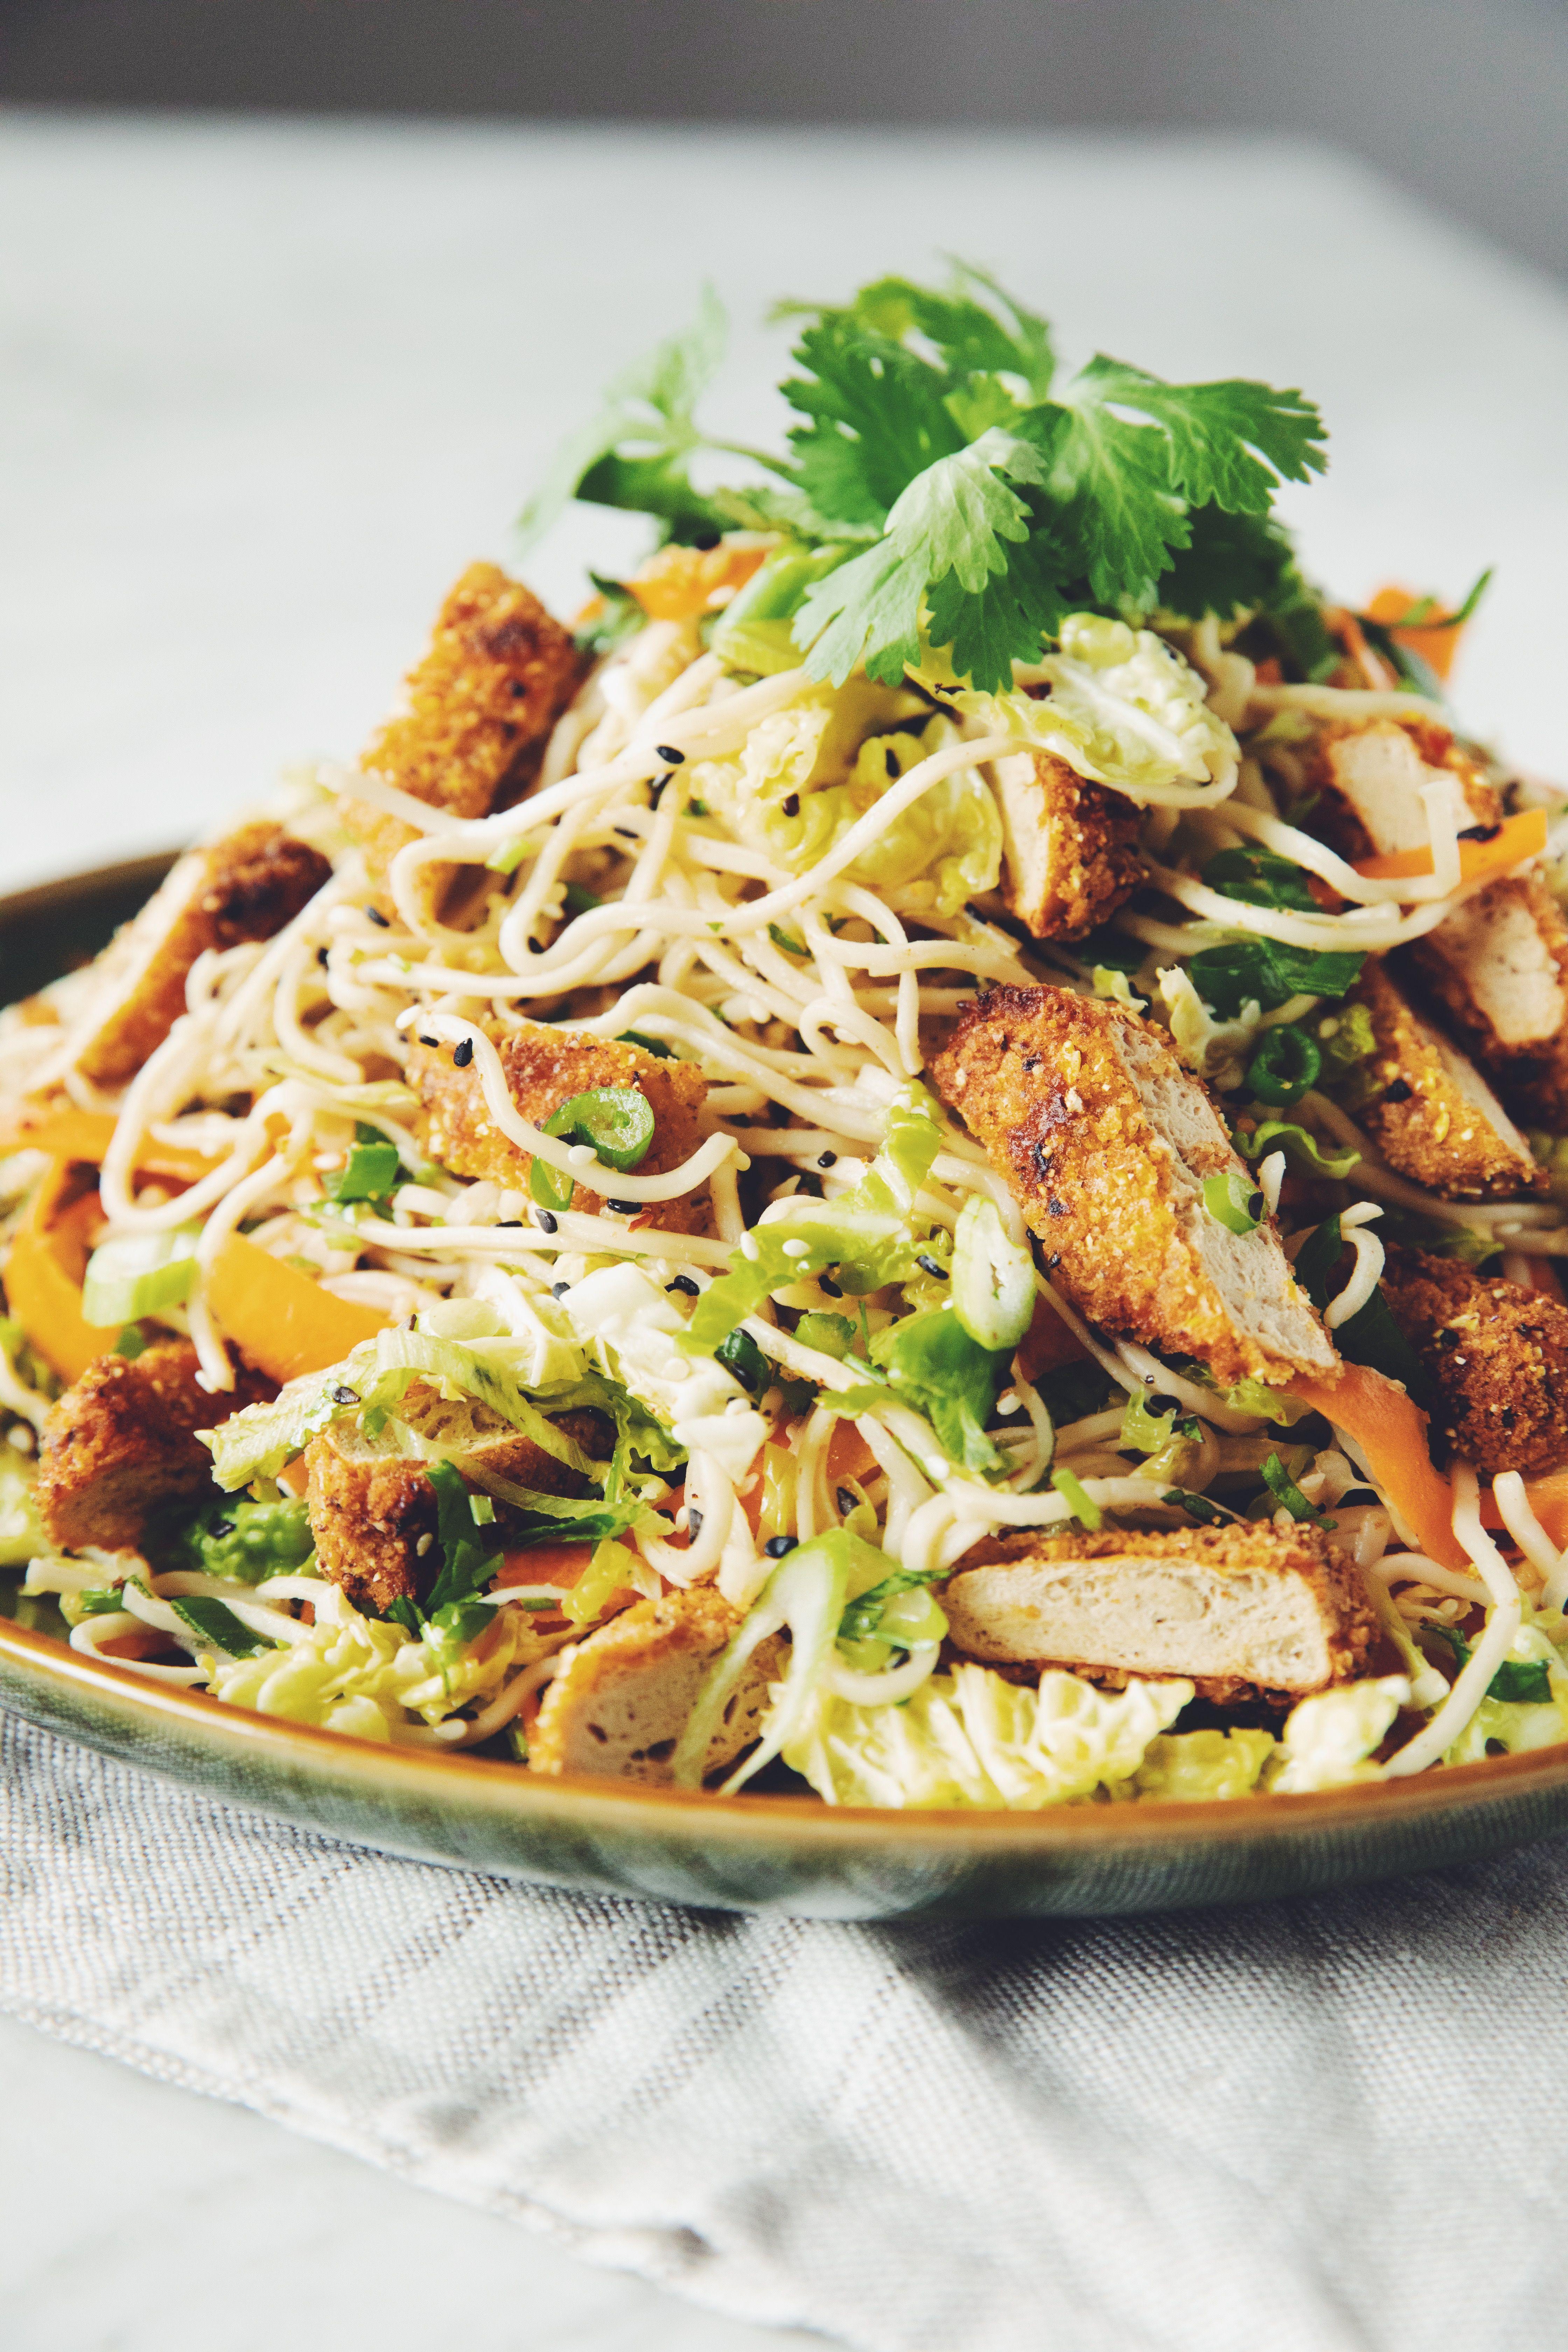 Vegan Crispy Chicken Asian Noodle Salad Recipe Asian Noodle Salad Crispy Chicken Asian